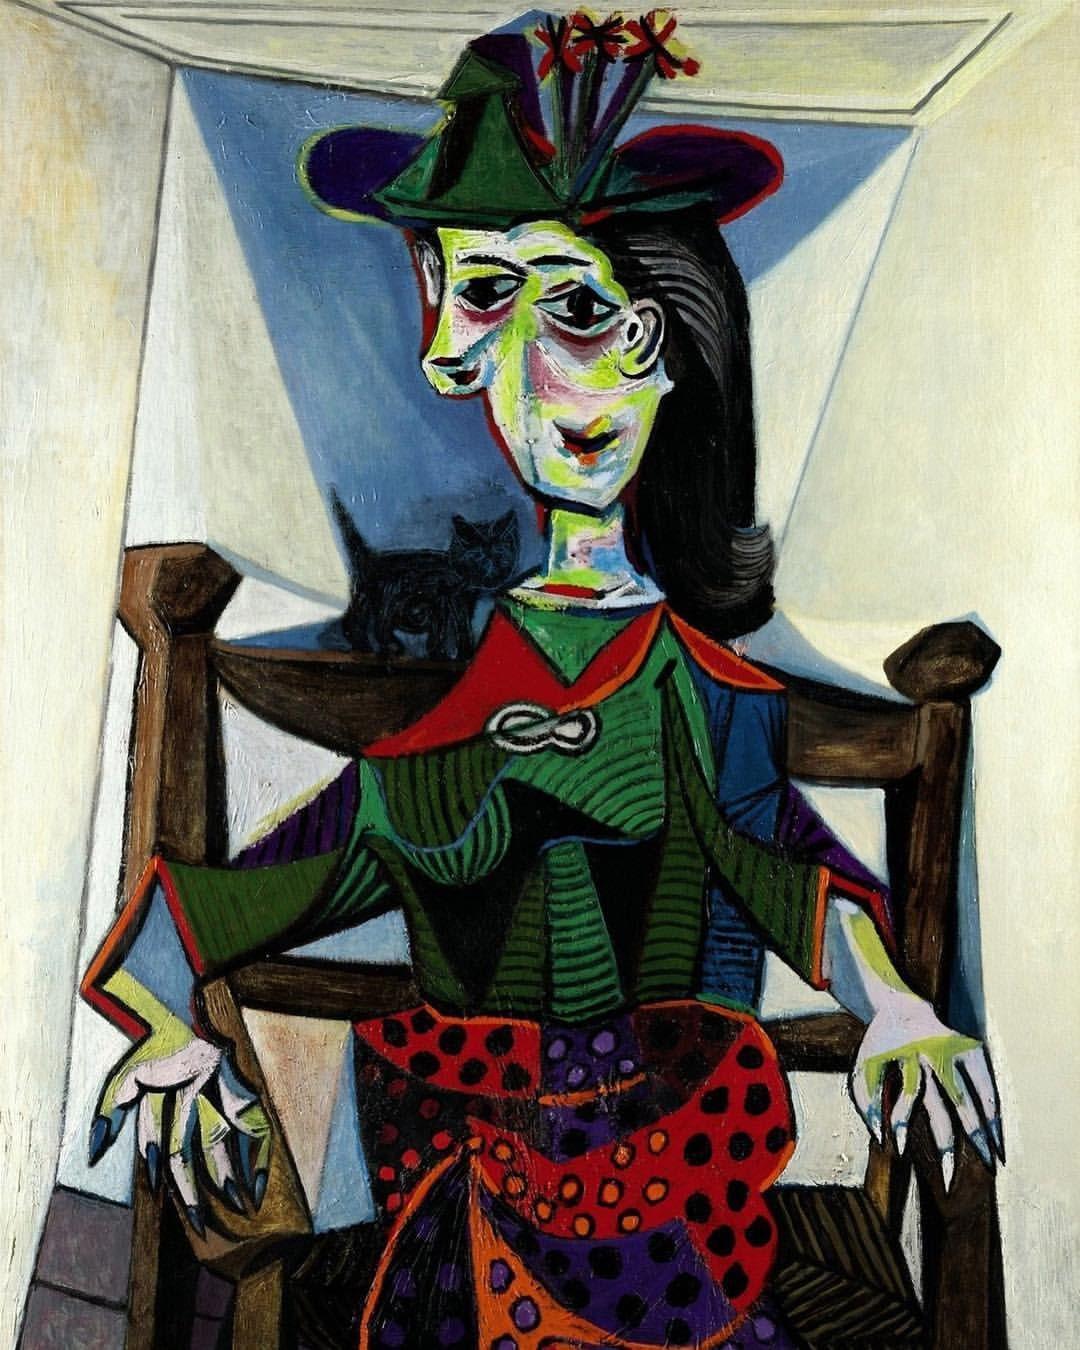 Pablo Picasso, Dora Maar au Chat, 1941